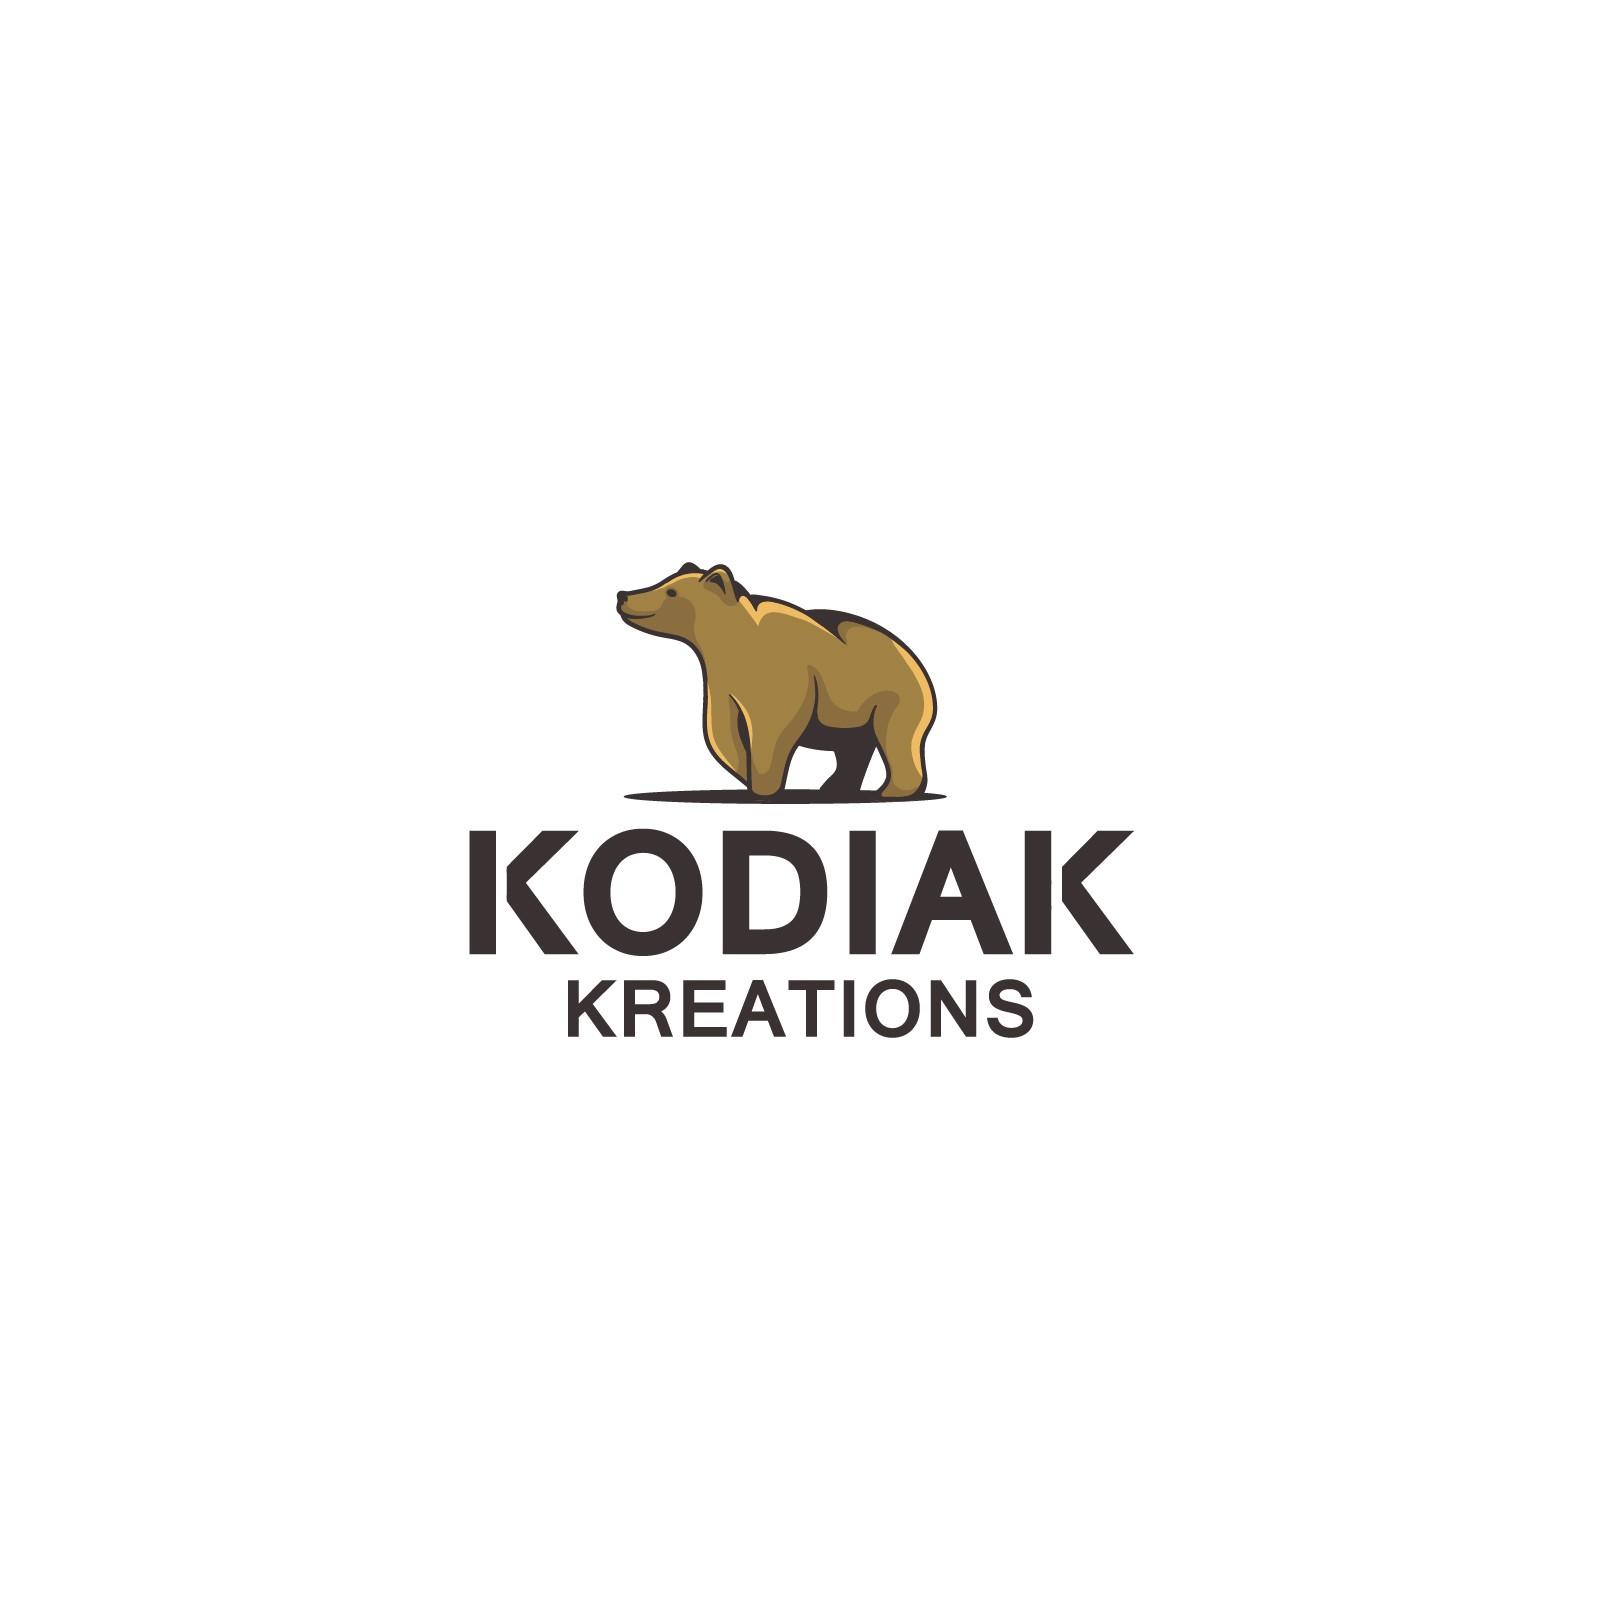 Kodiak Kreations looking for a kid-friendly design.